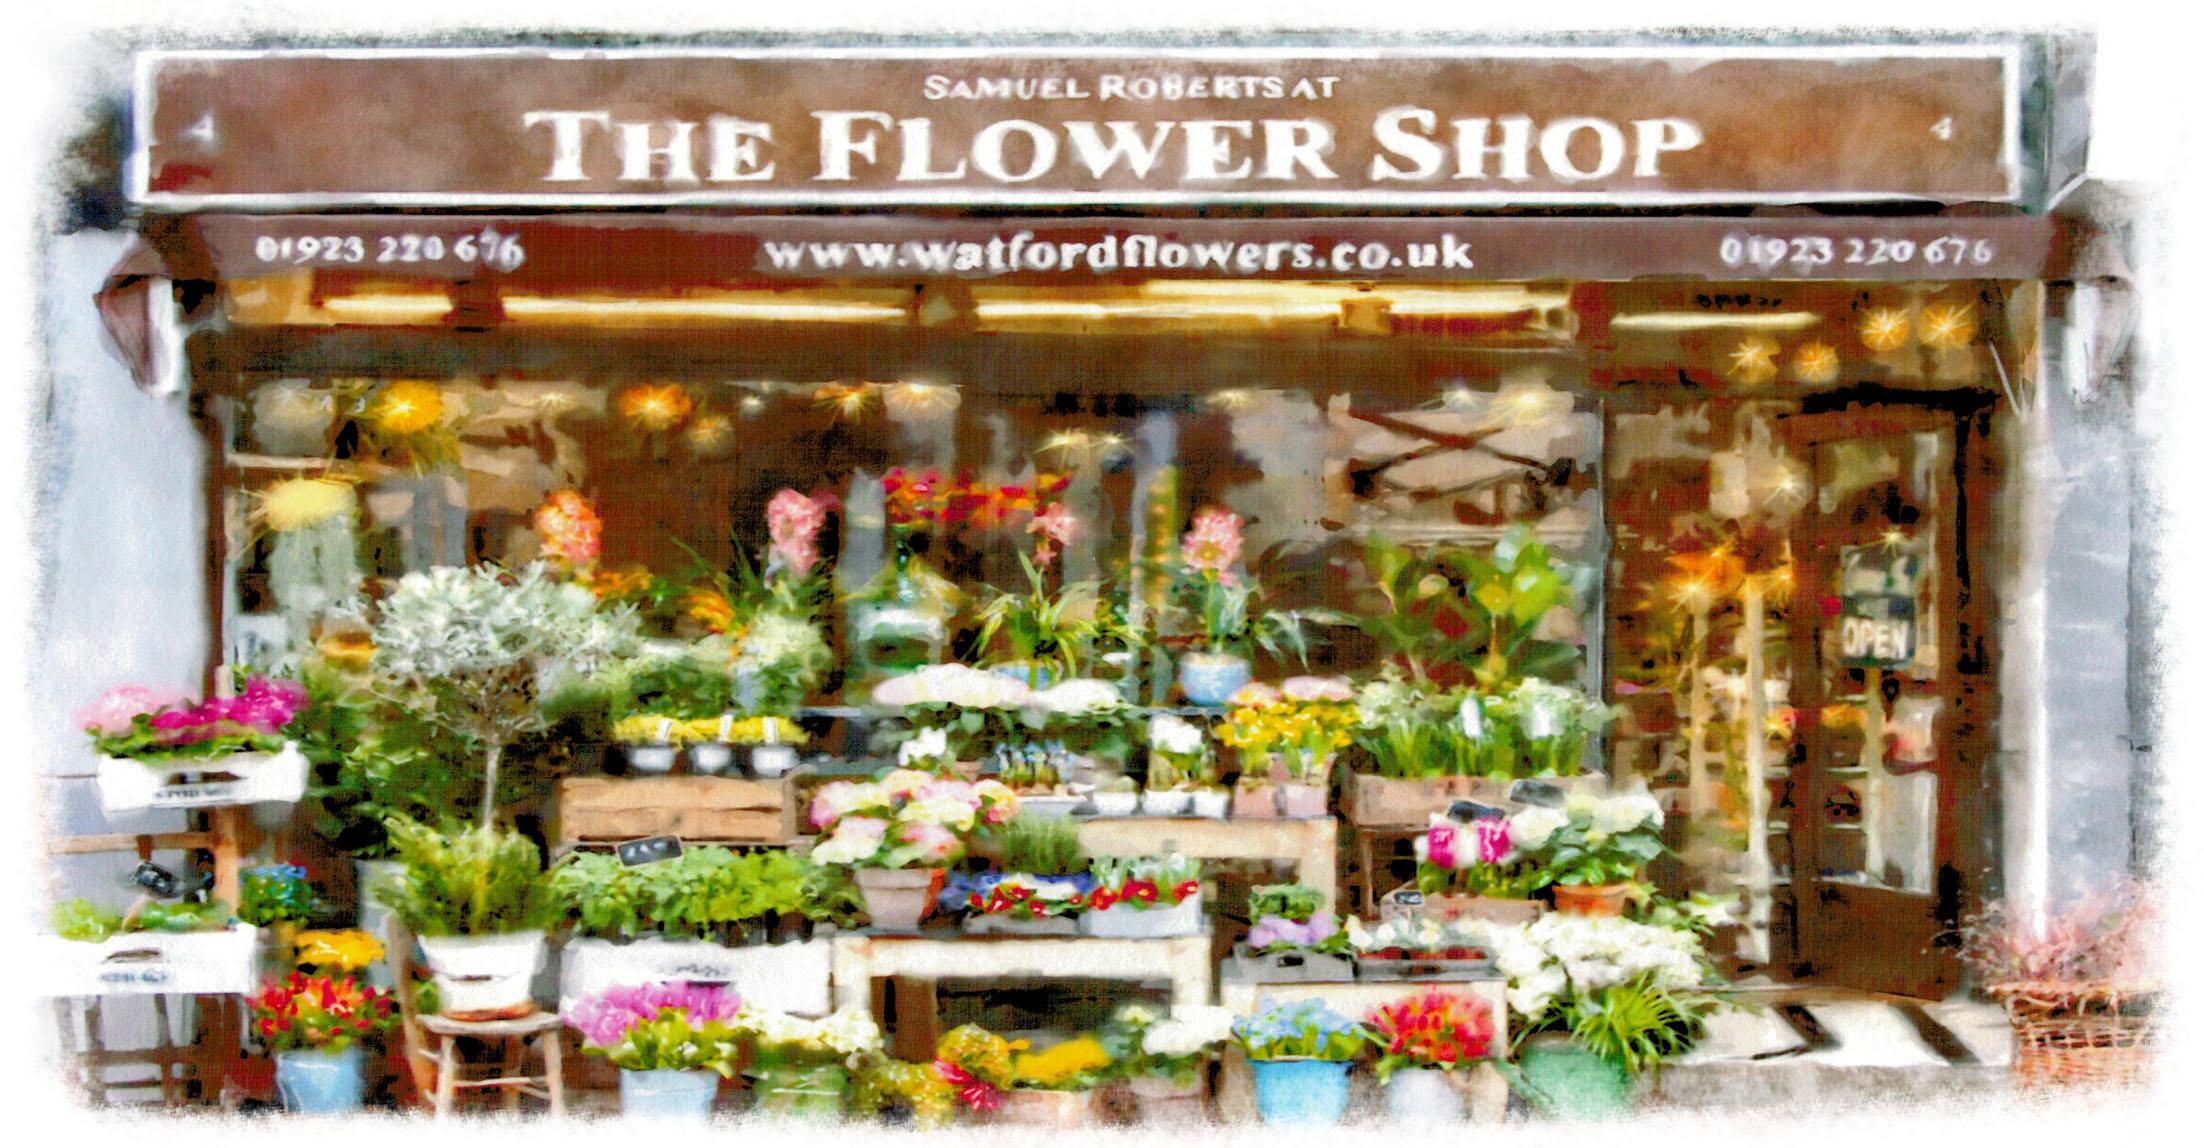 The Flower Shop Watford Florist Order Online 01923 220676